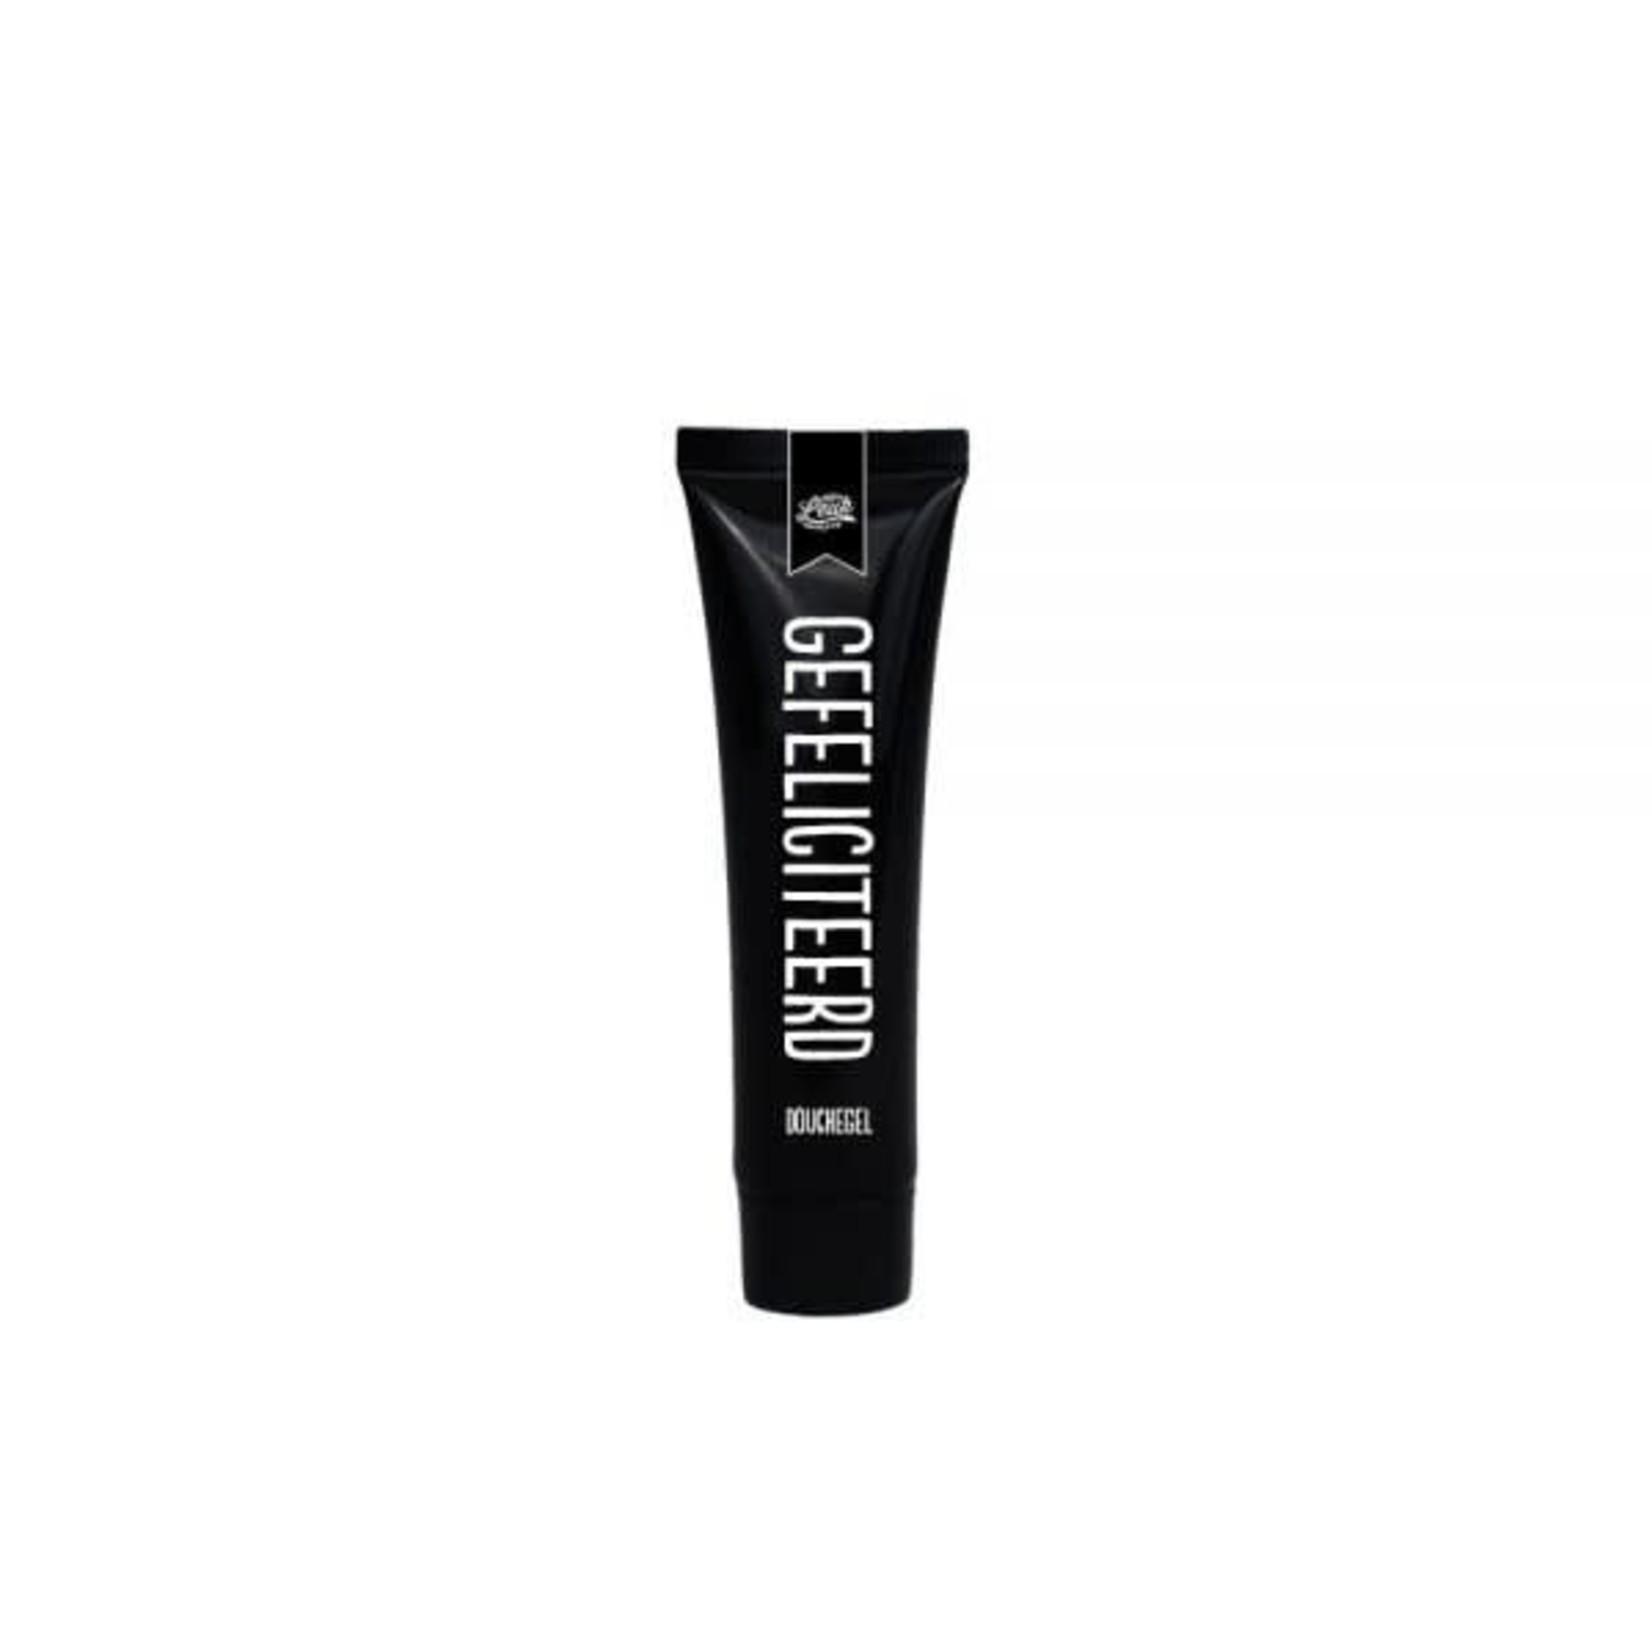 100% leuk Mini tube douchegel zwart - Gefeliciteerd